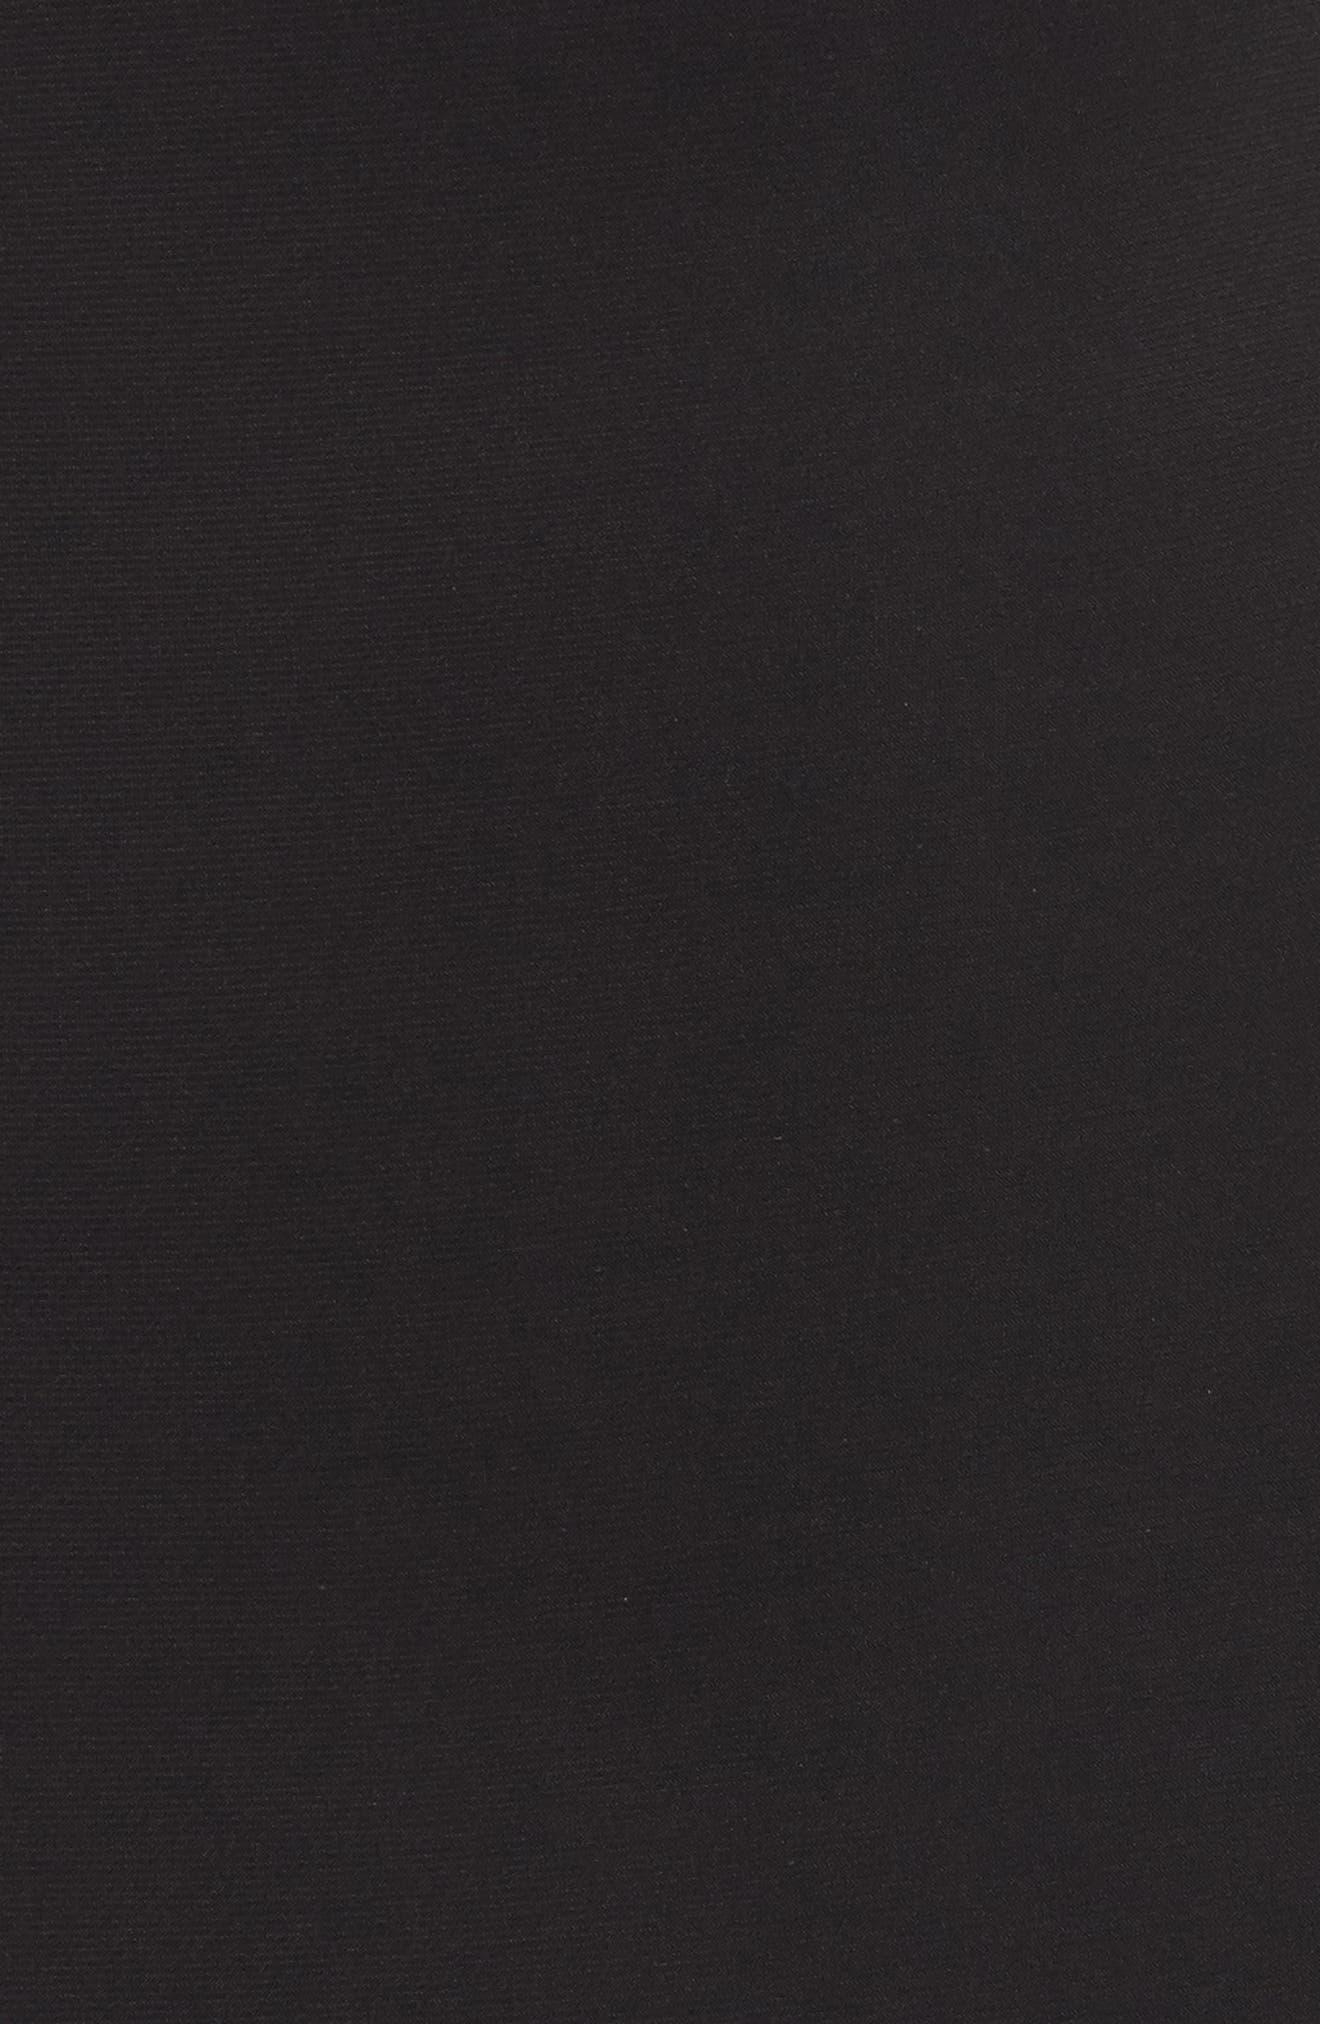 Beaded Mesh & Jersey Sheath Dress,                             Alternate thumbnail 5, color,                             009